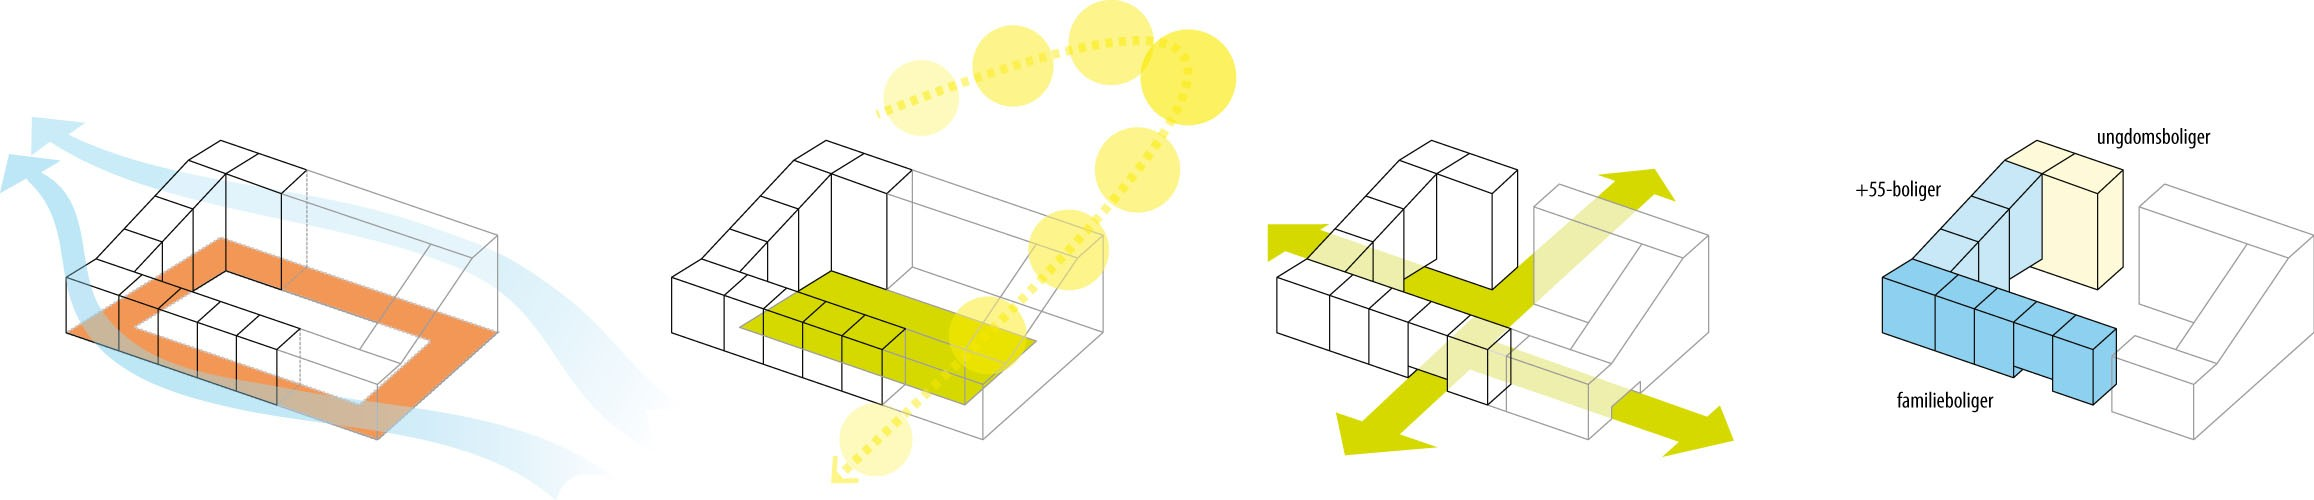 http://jacoposartore.com/files/gimgs/th-14_03_diagrams-1.jpg